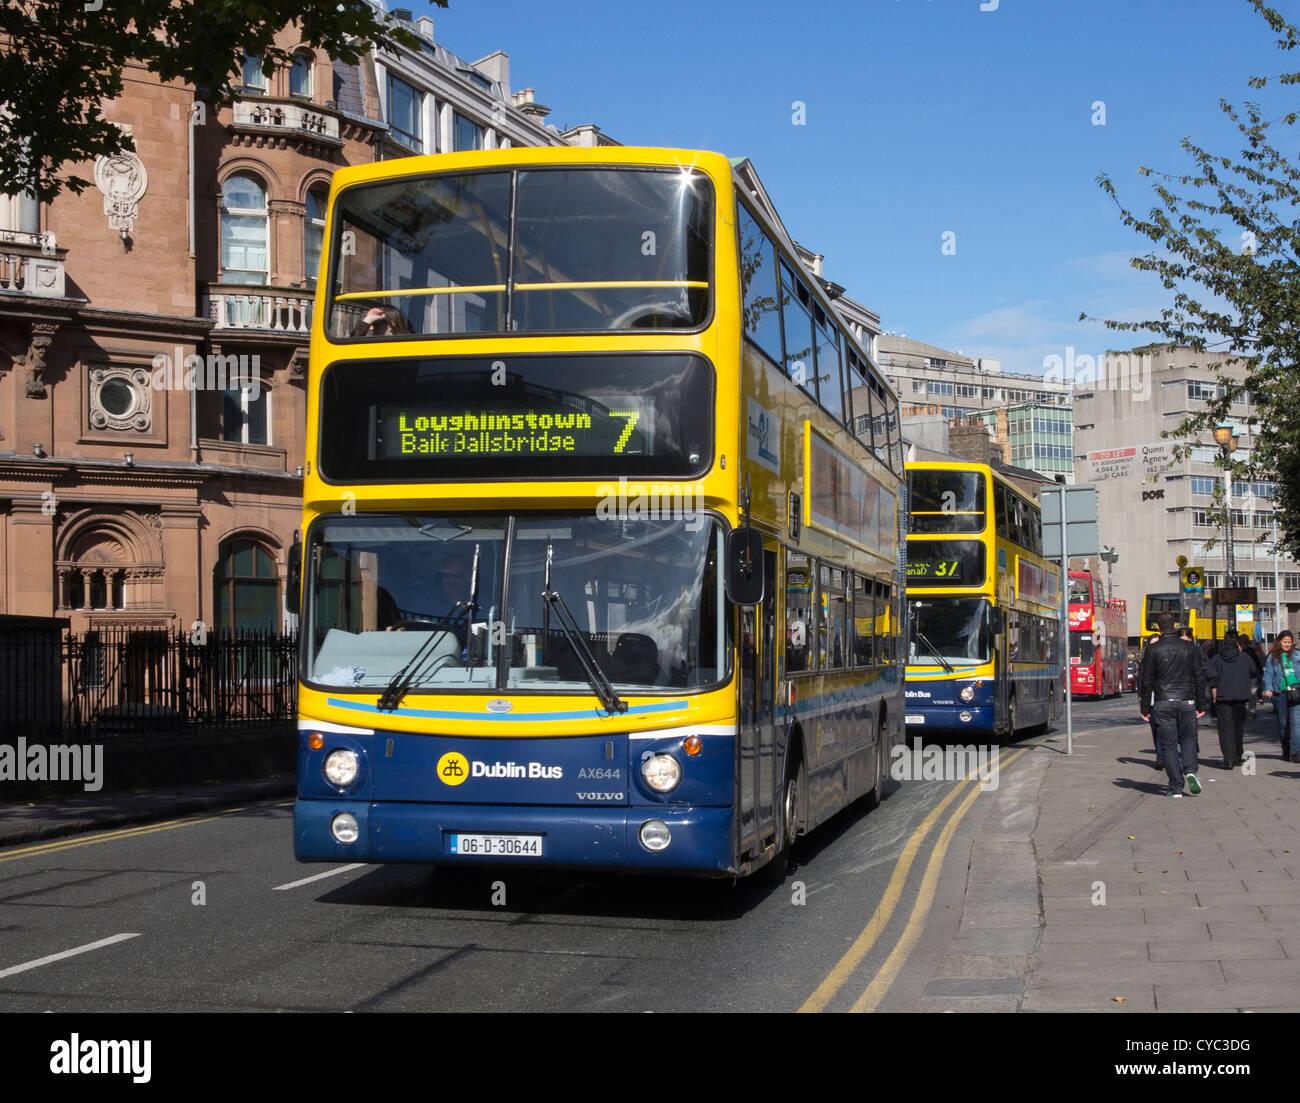 Row of Dublin buses in a city centre street in Dublin, Ireland - Stock Image